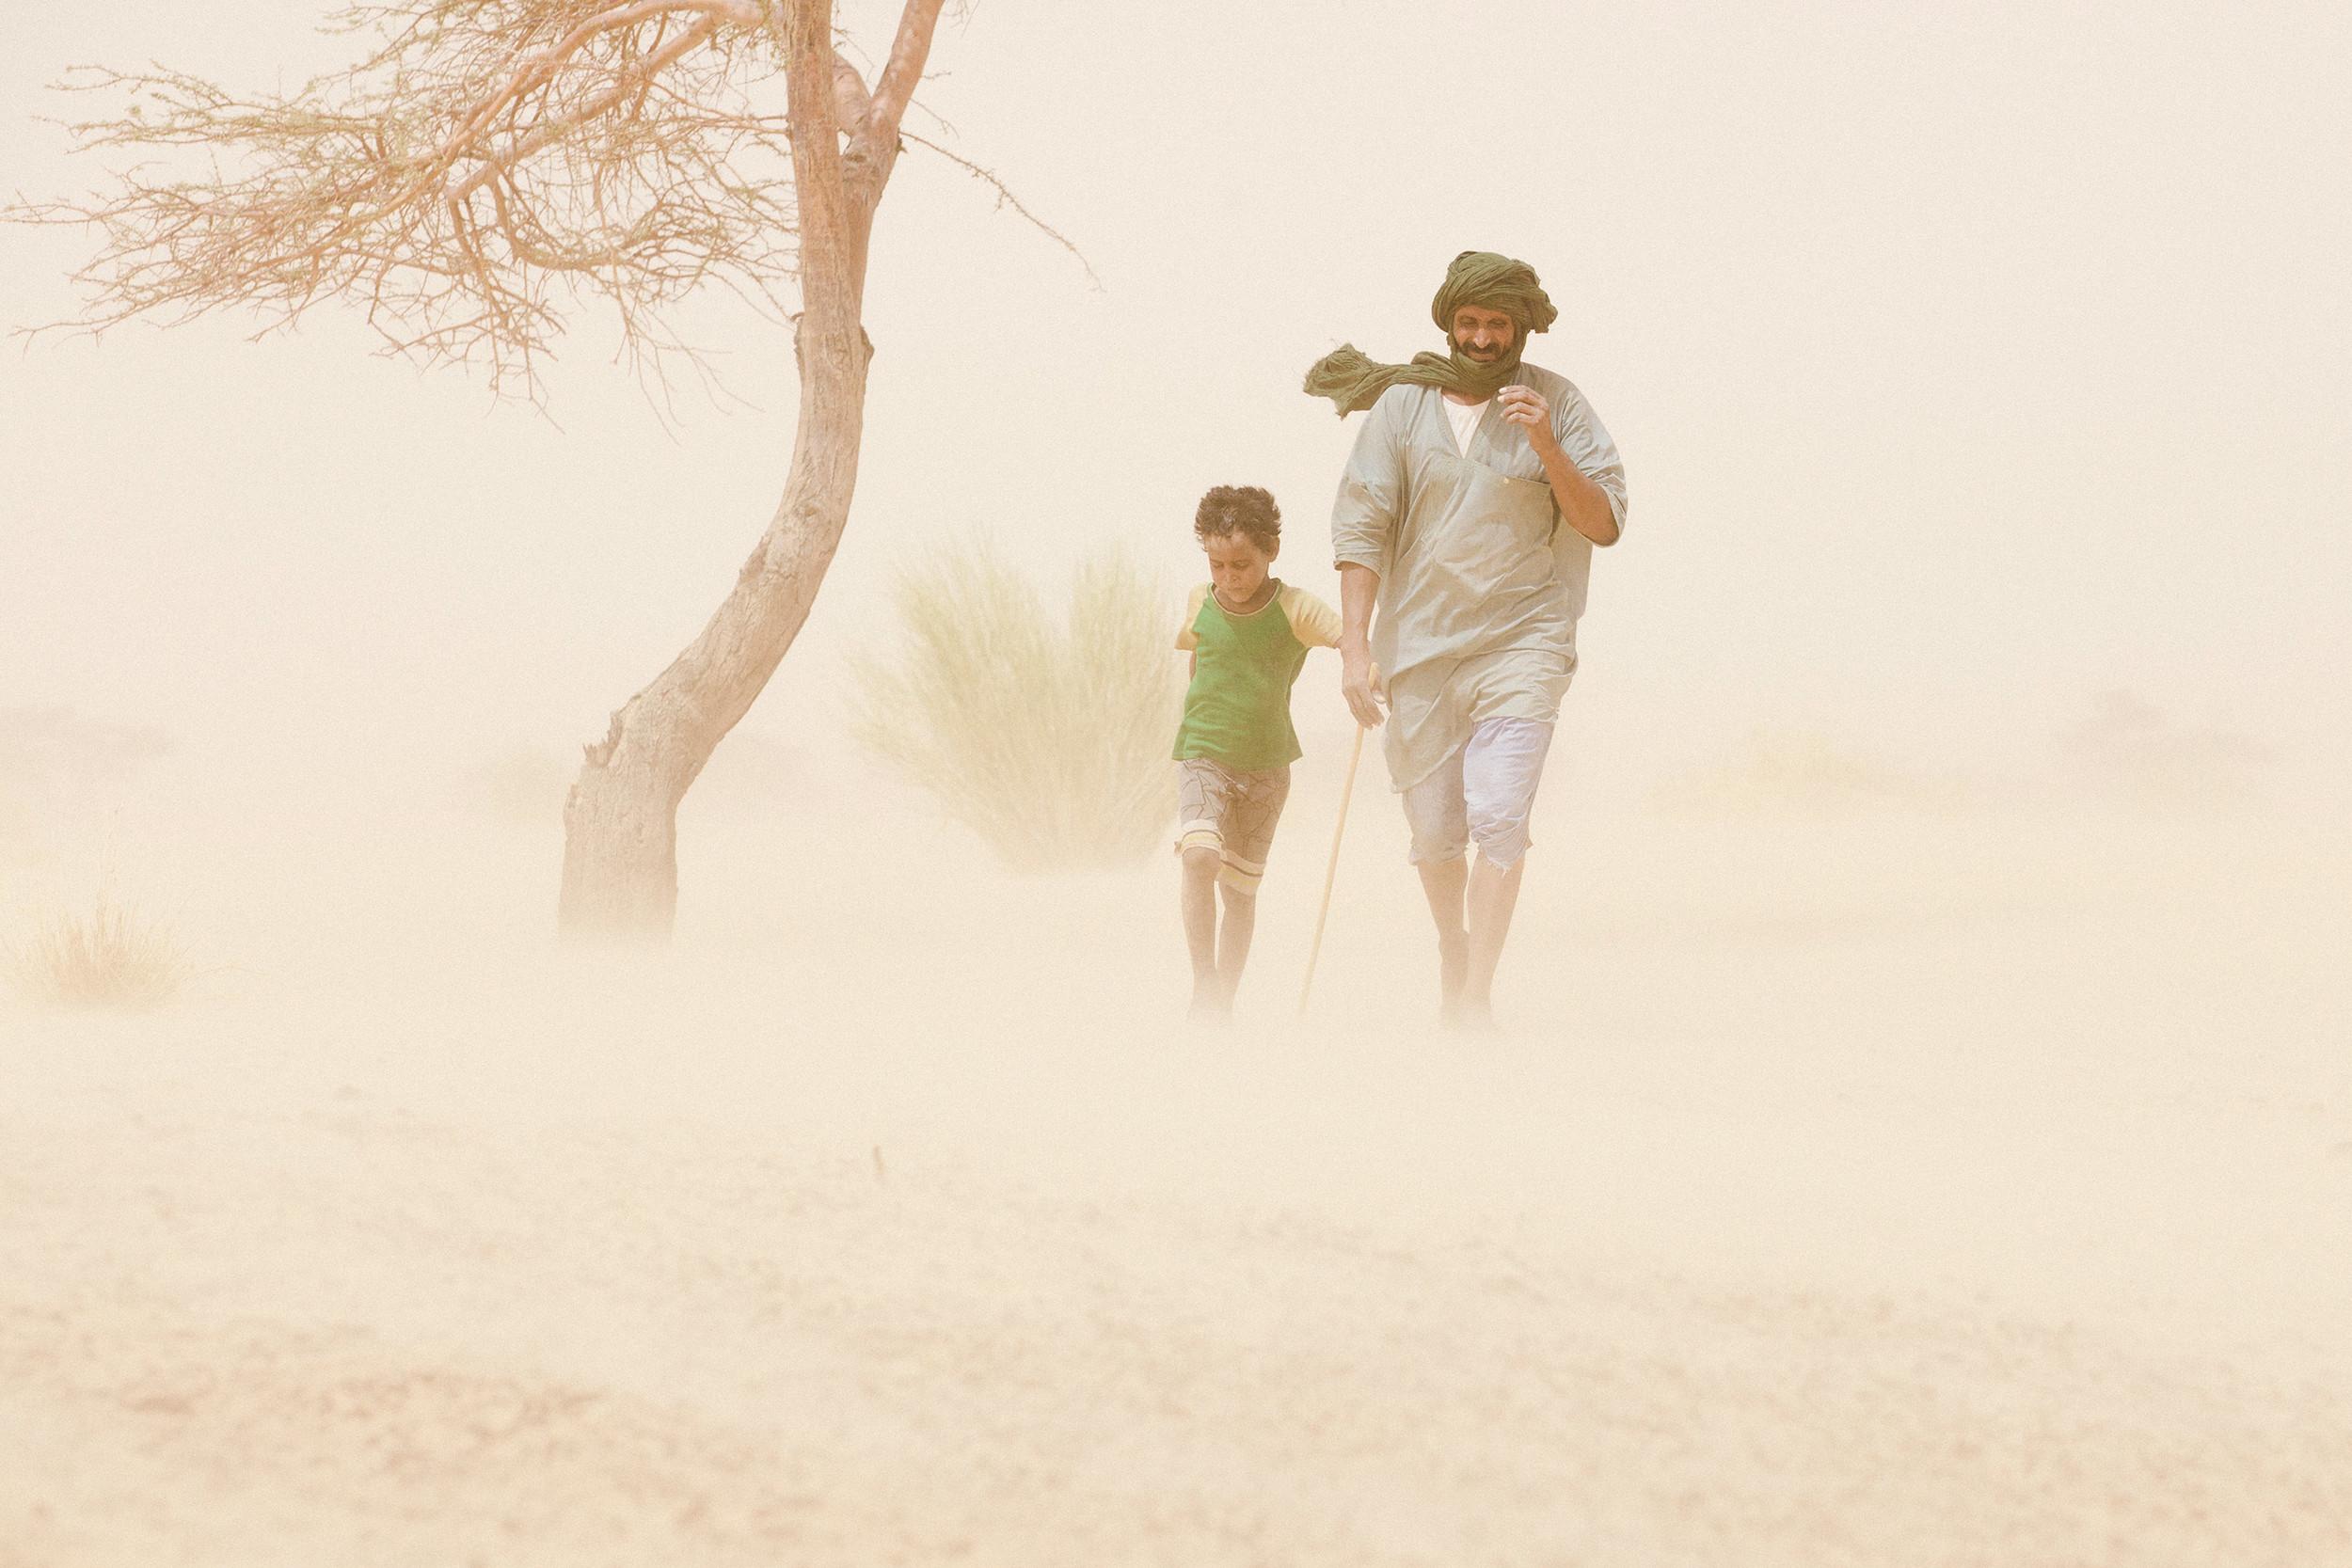 Sahara desert, Mauritania - 2013 |Canon EOS 5D MKIII 70-200mm@142mm, f/7.1, ISO 125, 1/1000s